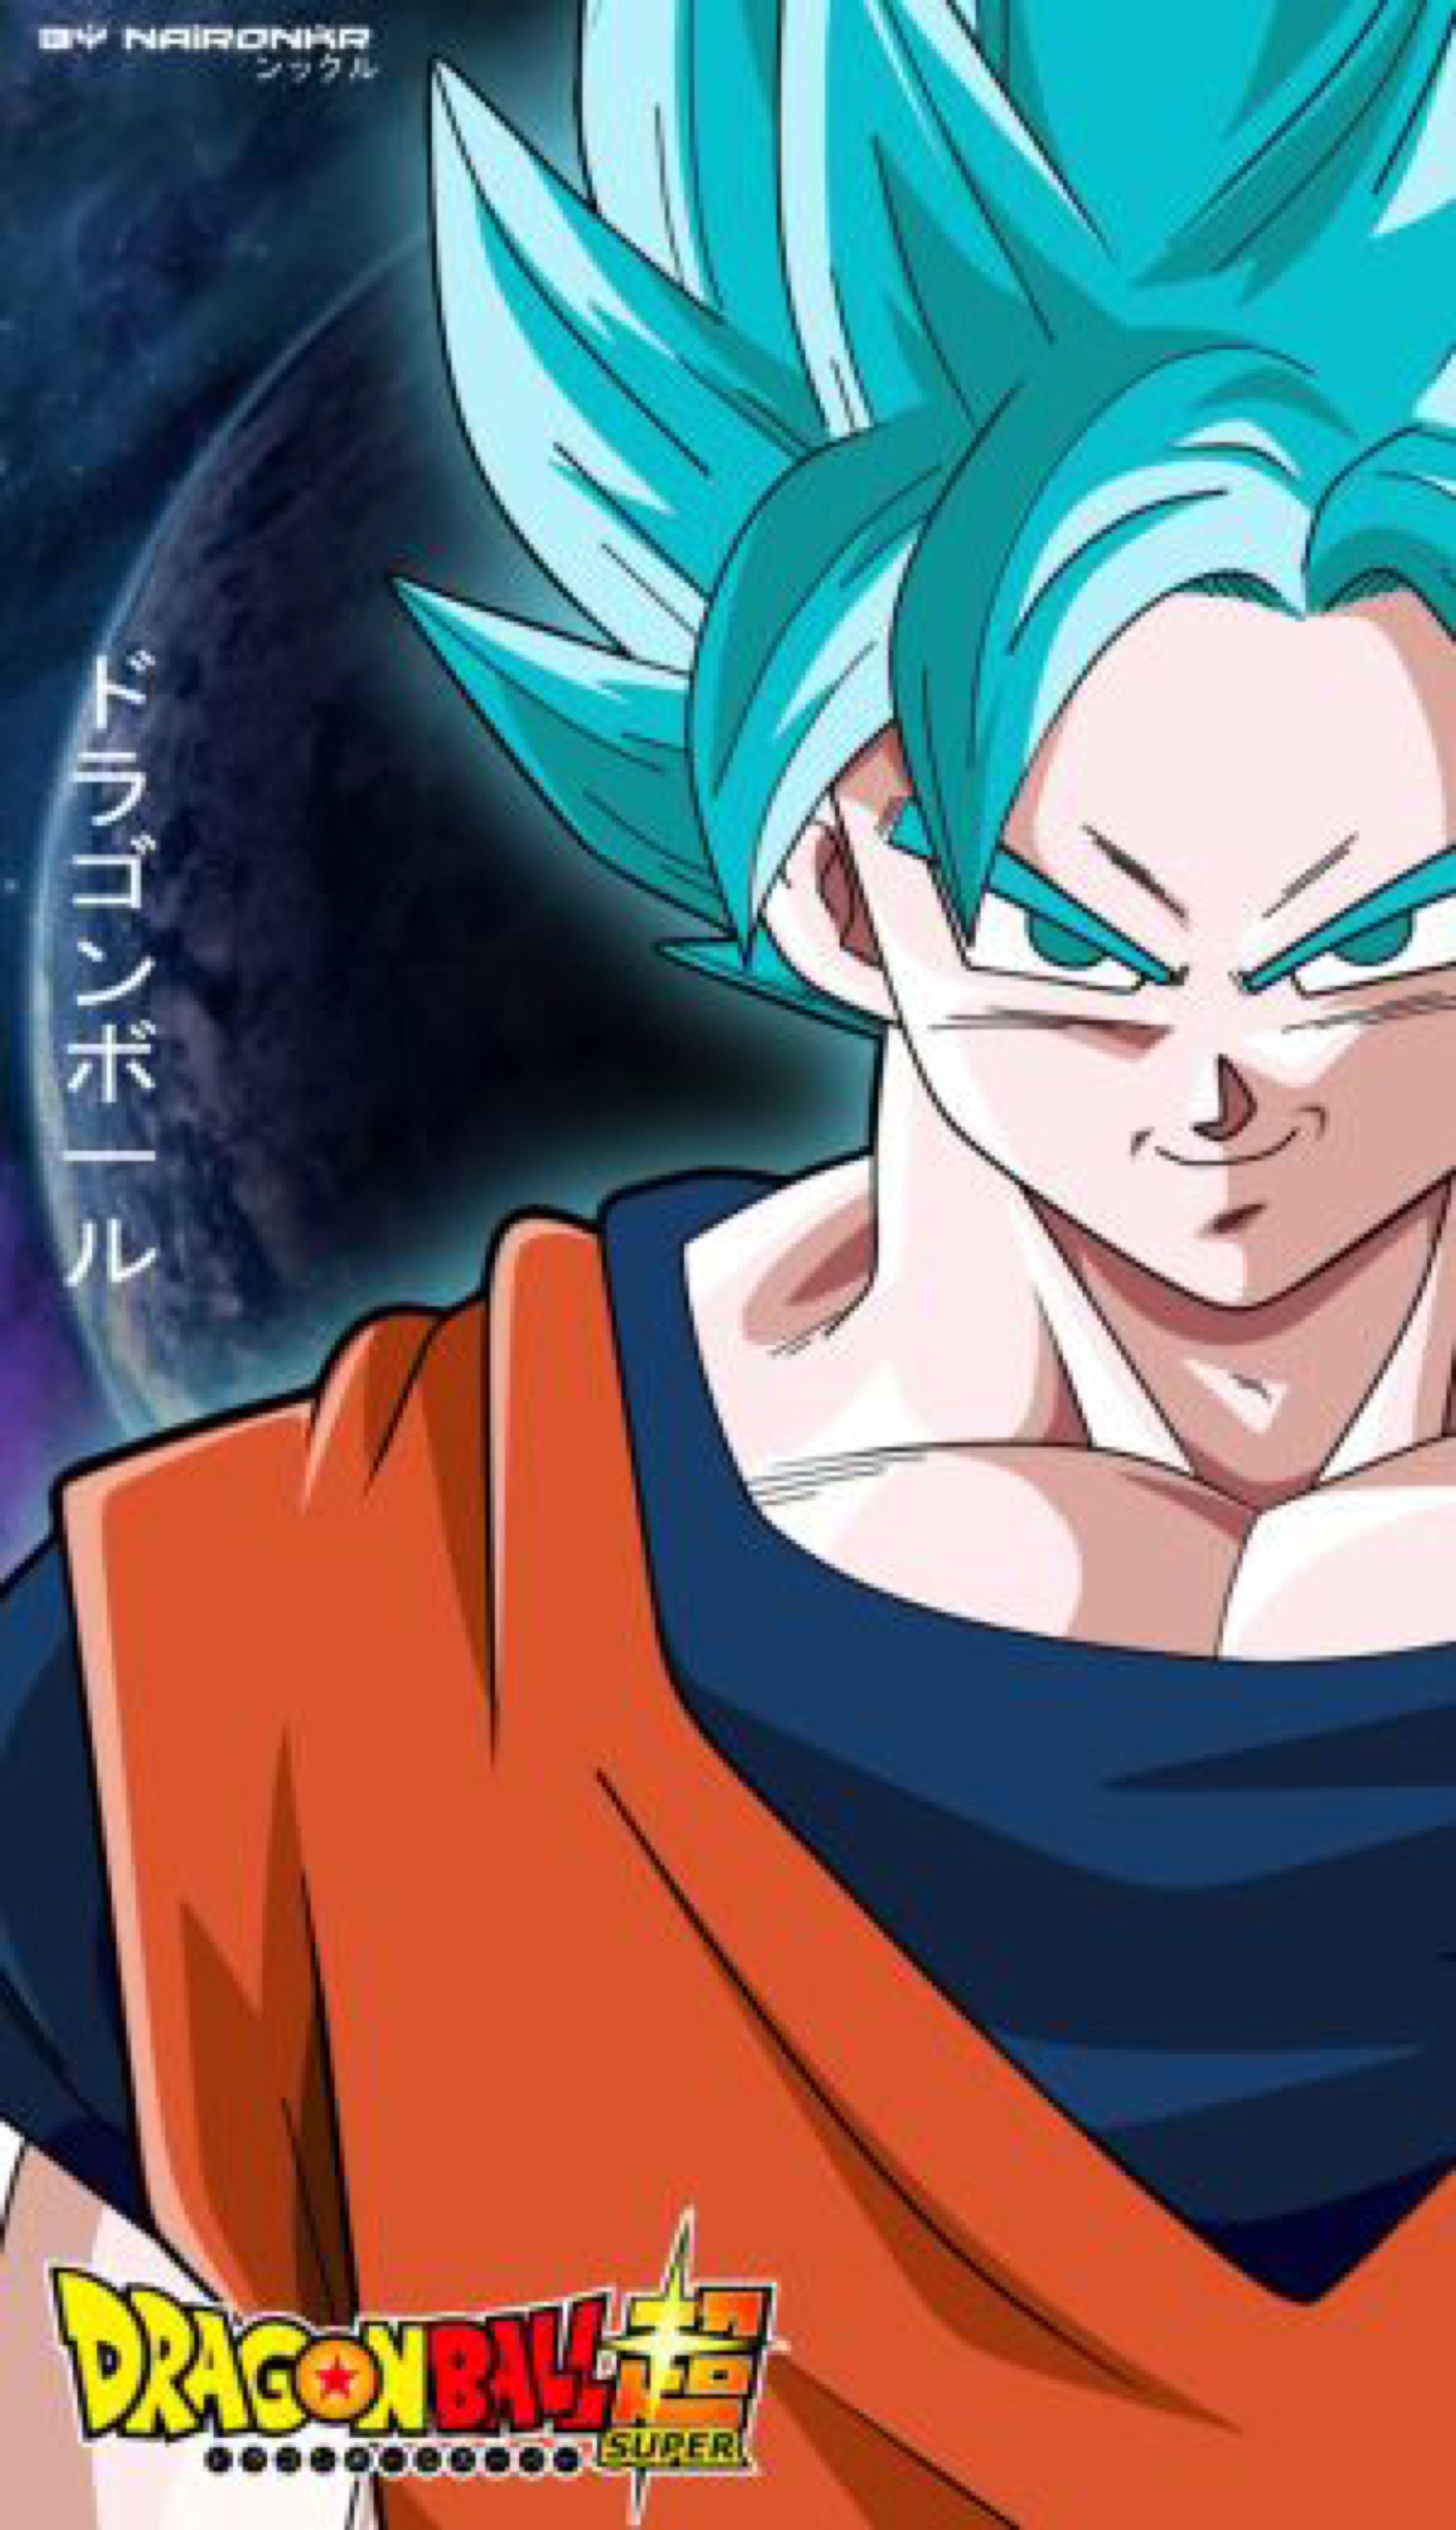 Goku Super Saiyajin Blue Posters By Naironkr On Deviantart Dragon Ball Super Goku Dragon Ball Art Blue Poster Dragon ball z goku blue moon